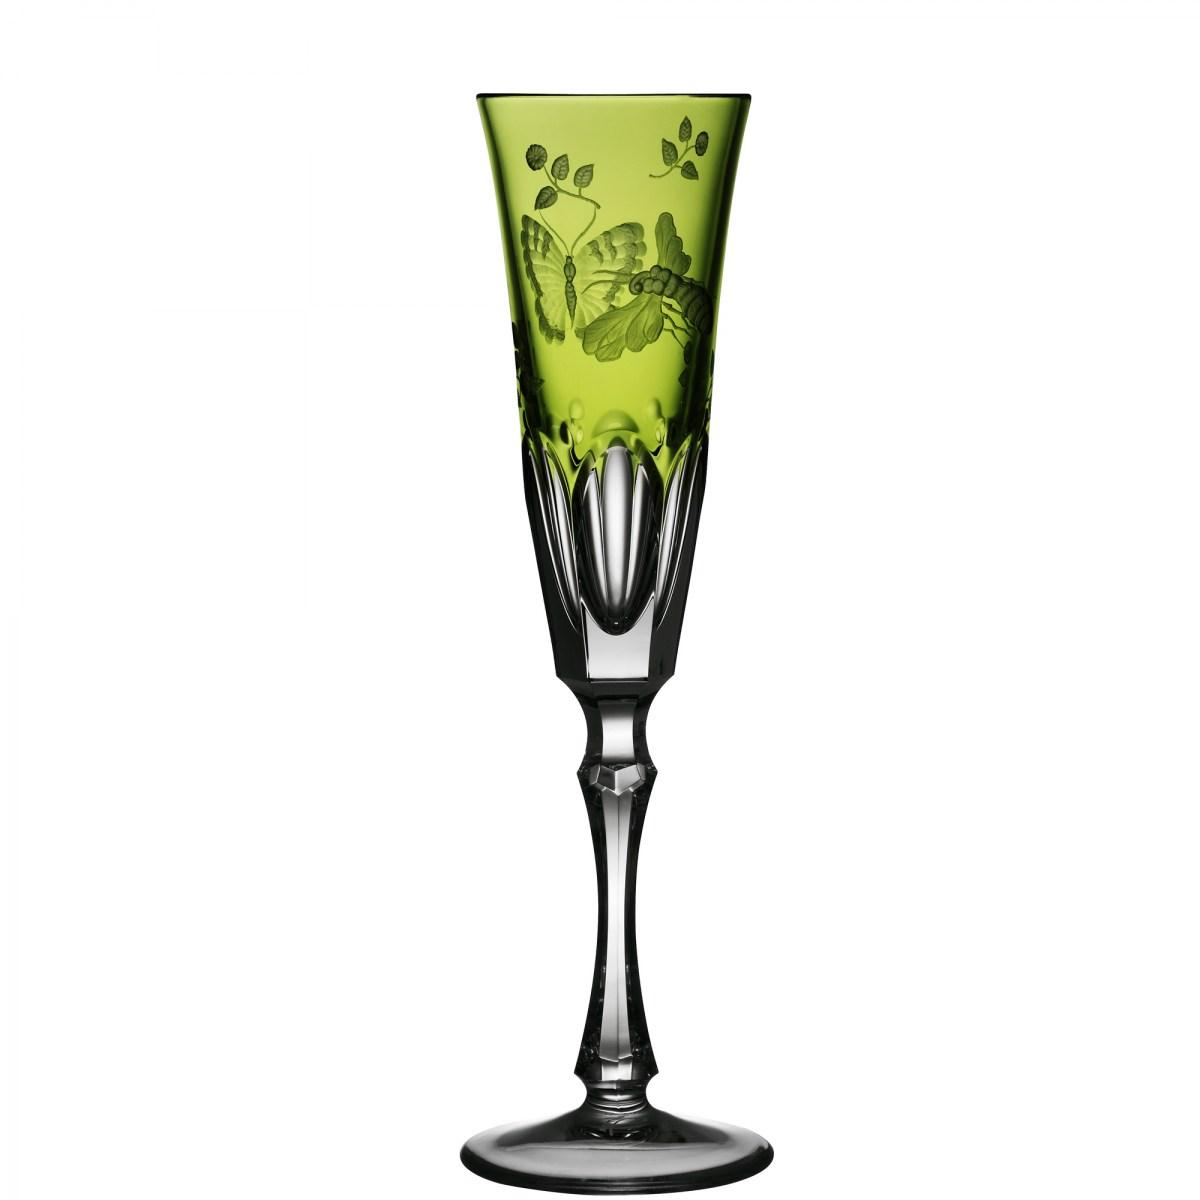 Springtime Yellow-Green Flute - $ 272 / € 238